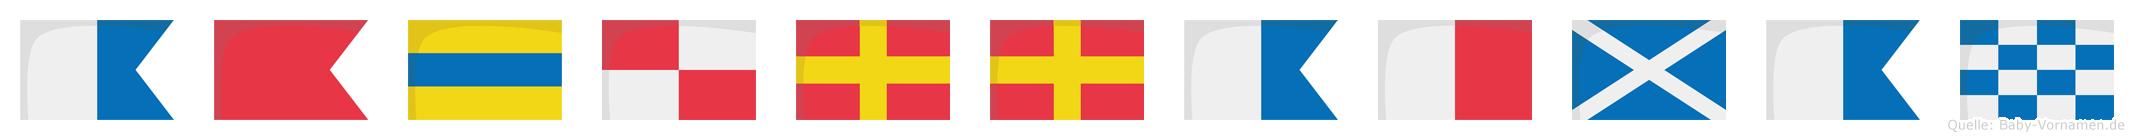 Abdurrahman im Flaggenalphabet